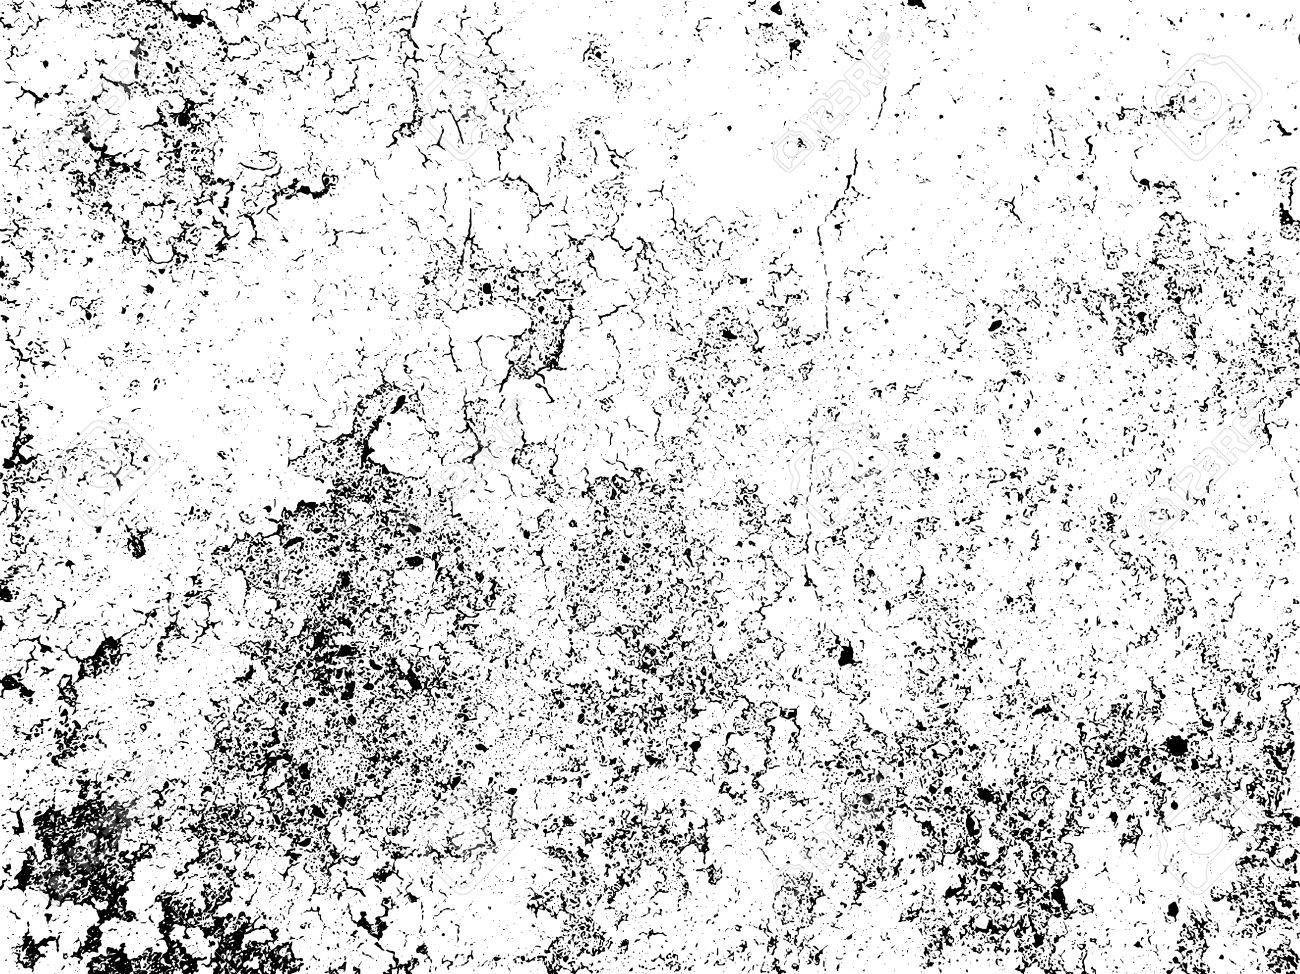 medium resolution of grunge clipart grunge texture 16 1300 x 974 dumielauxepices net